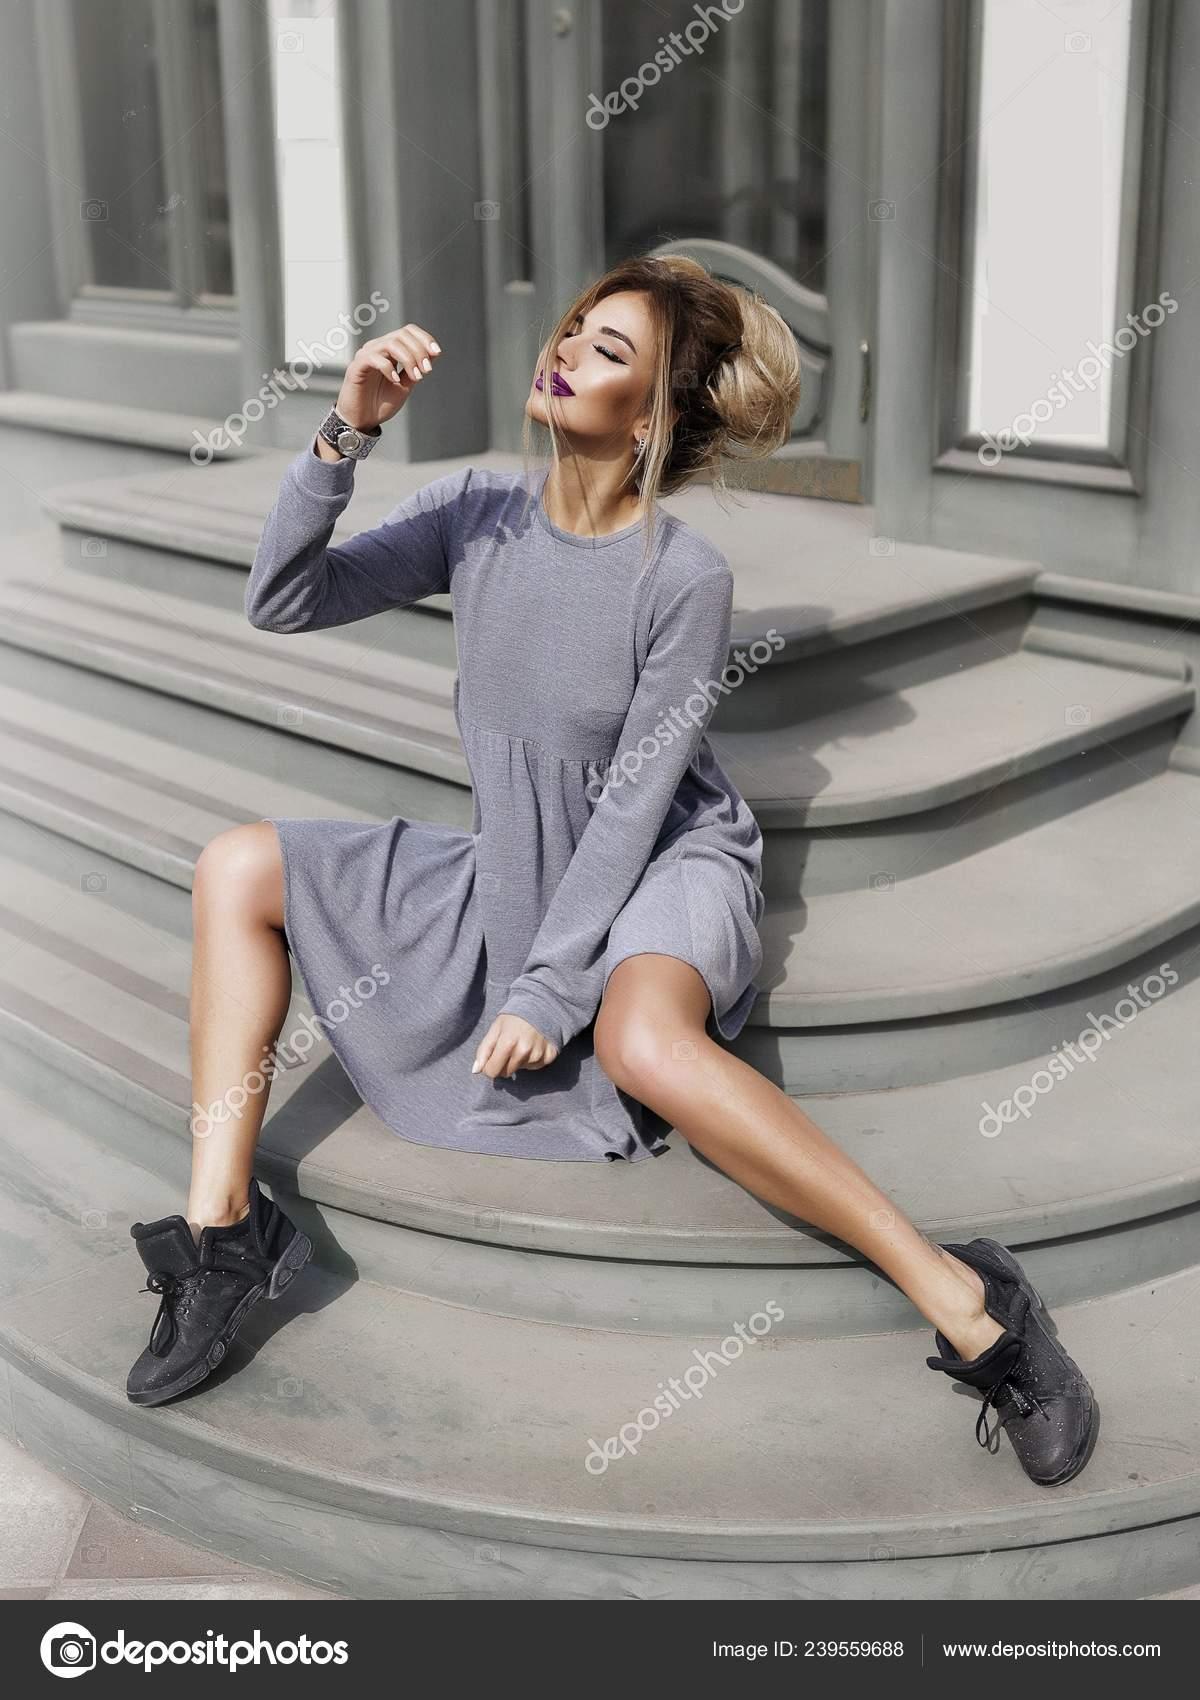 e5d7e5d7e48 회색 드레스와 블랙 스 니 커 즈 야외 카페 근처 계단에 앉아 멋진 젊은 모델. 머리, 예쁜 얼굴, 세련 된 헤어스타일에 메이크업.  부드러운 부드러운 피부, 슬림 바디.